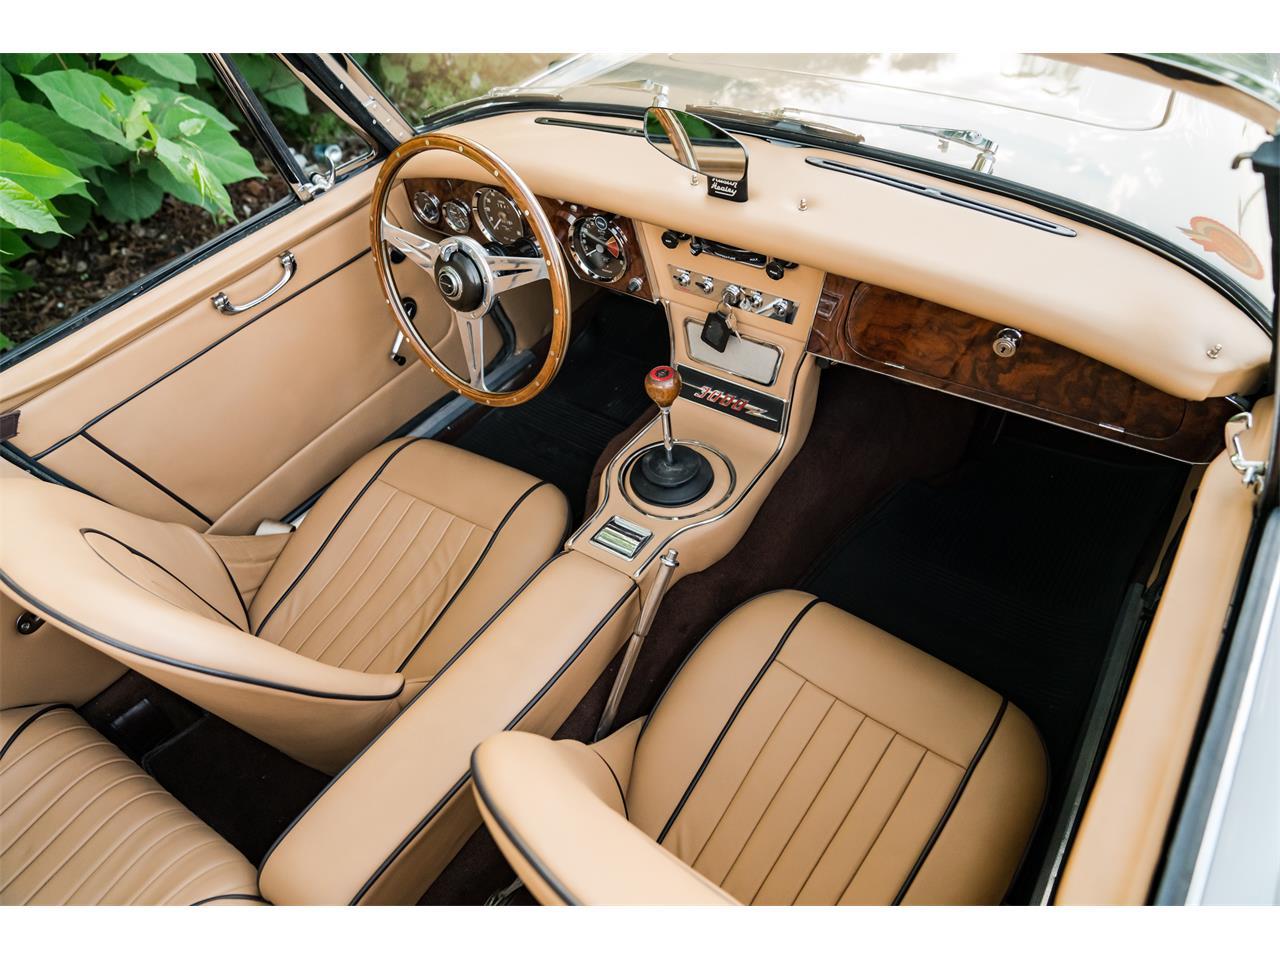 1967 Austin-Healey 3000 Mark III (CC-1220015) for sale in Philadelphia, Pennsylvania